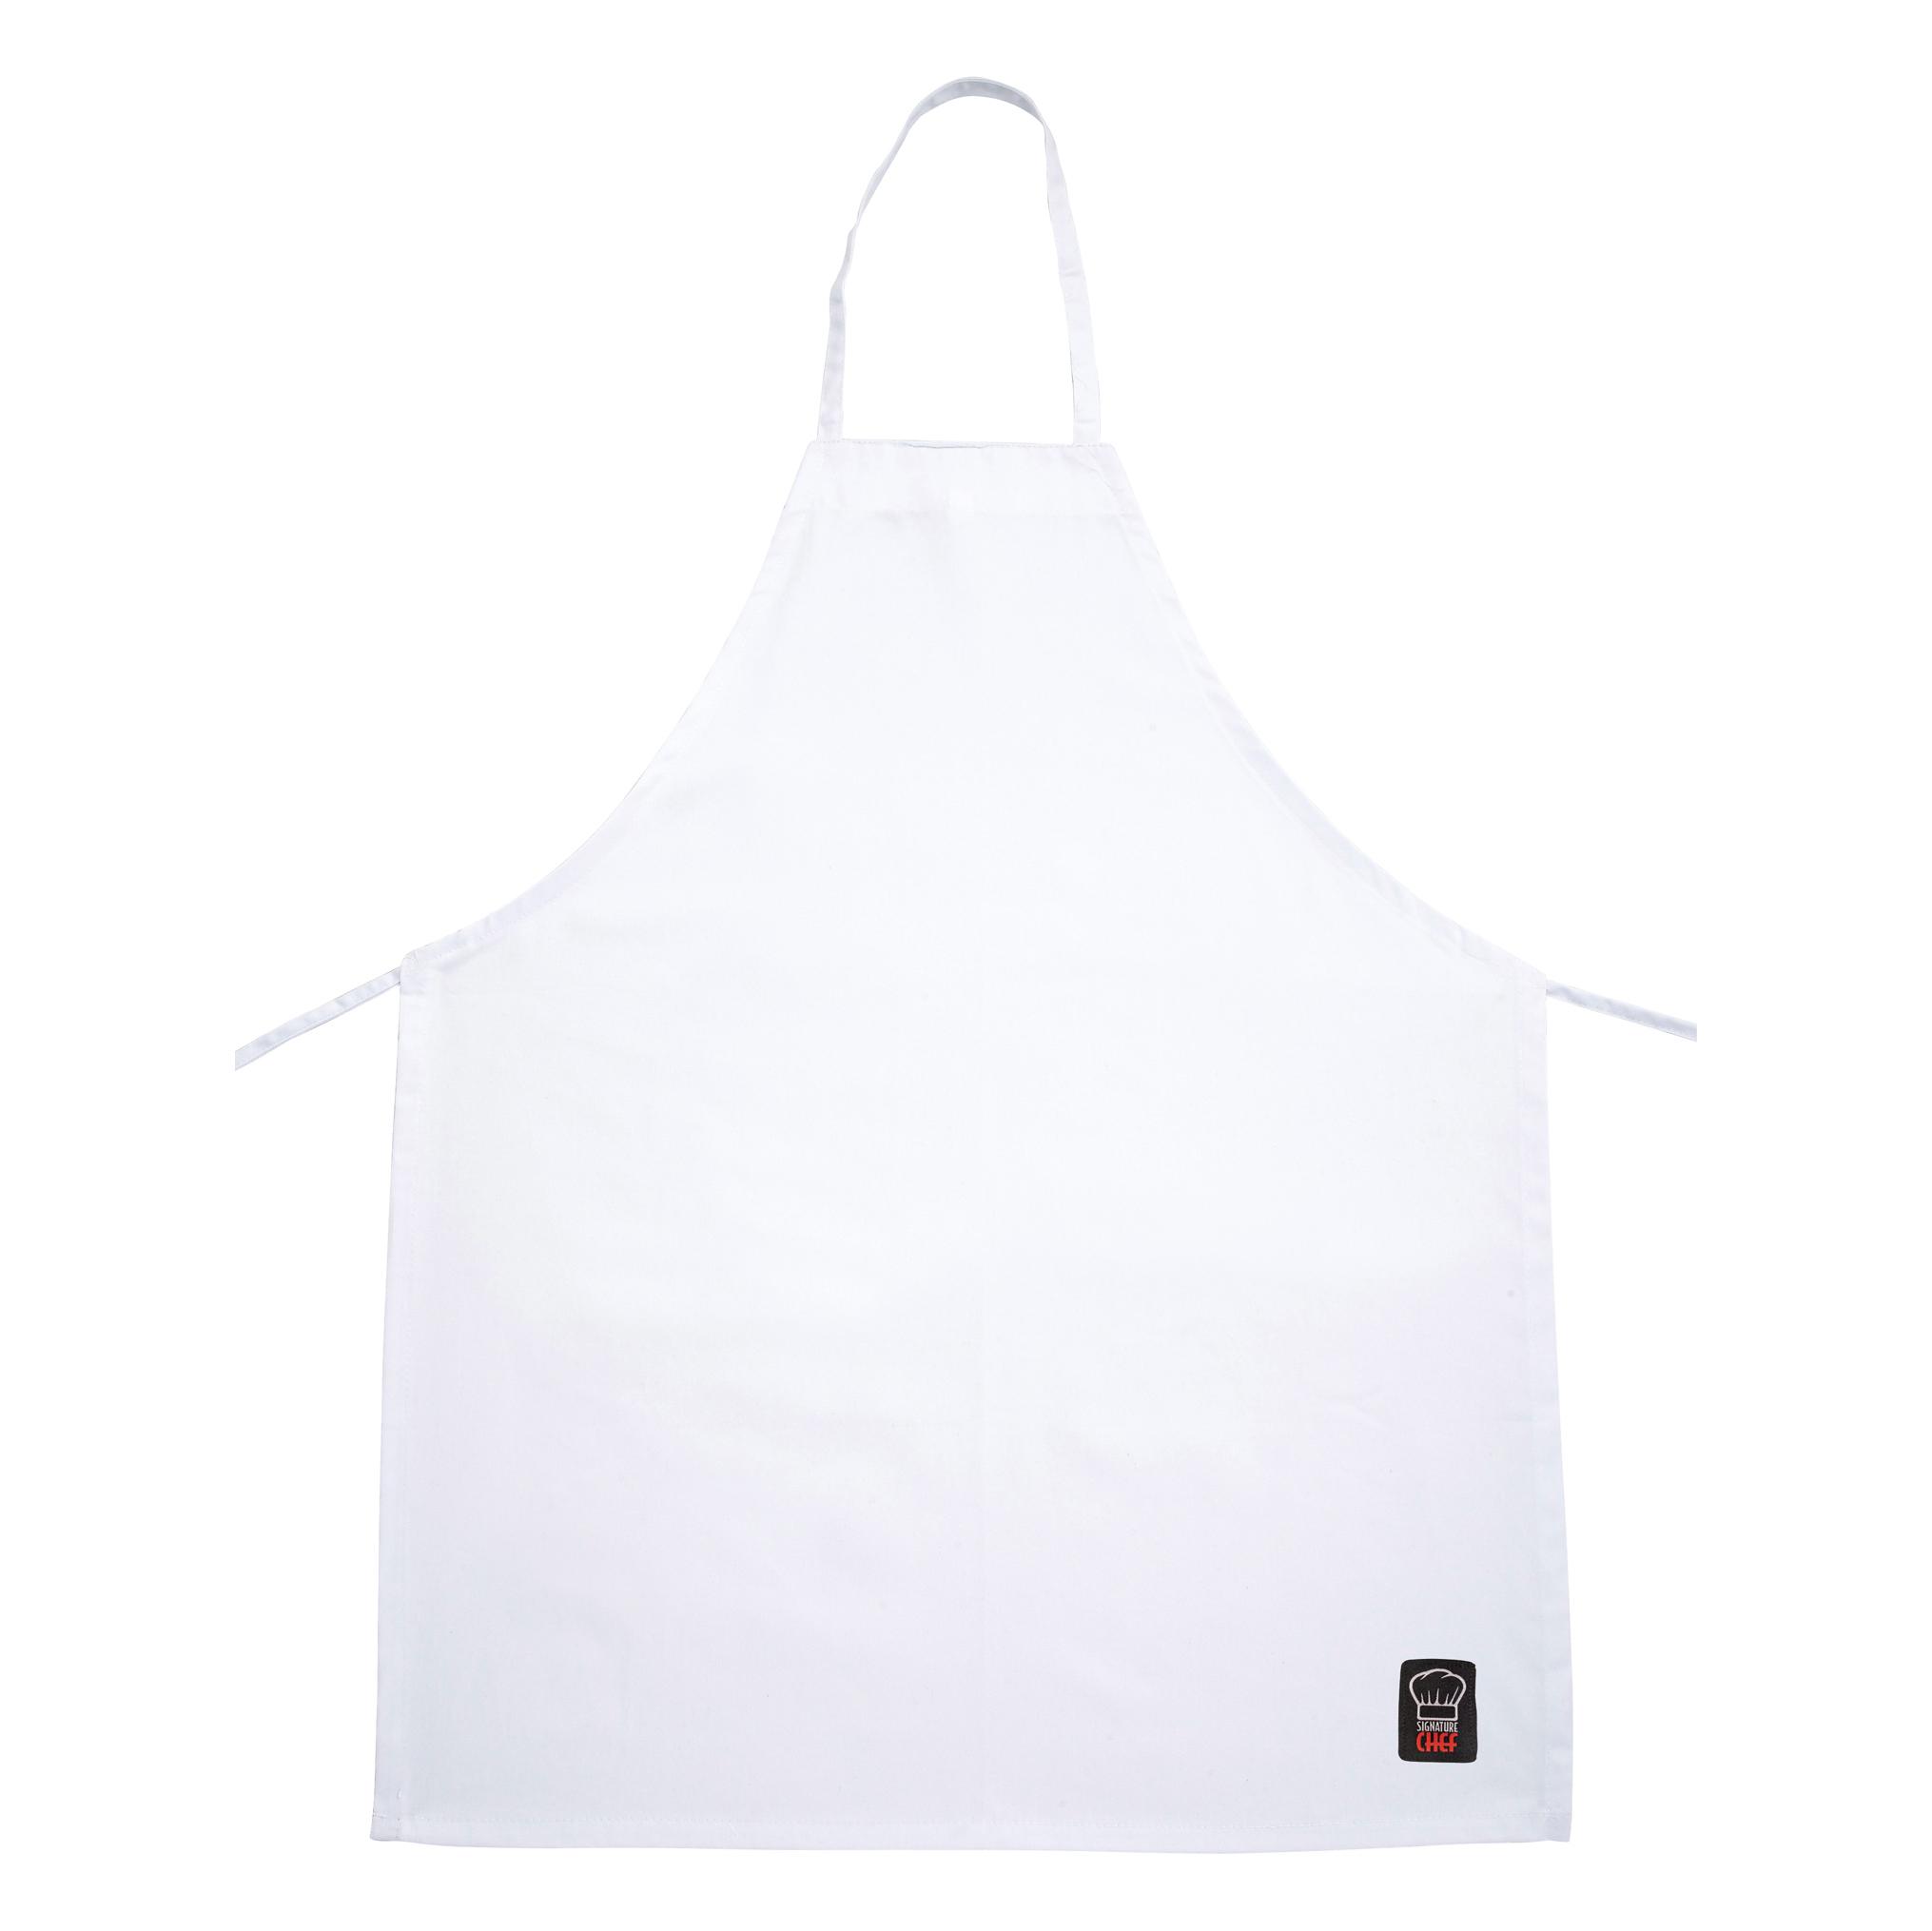 Winco BA-3226WH bib apron